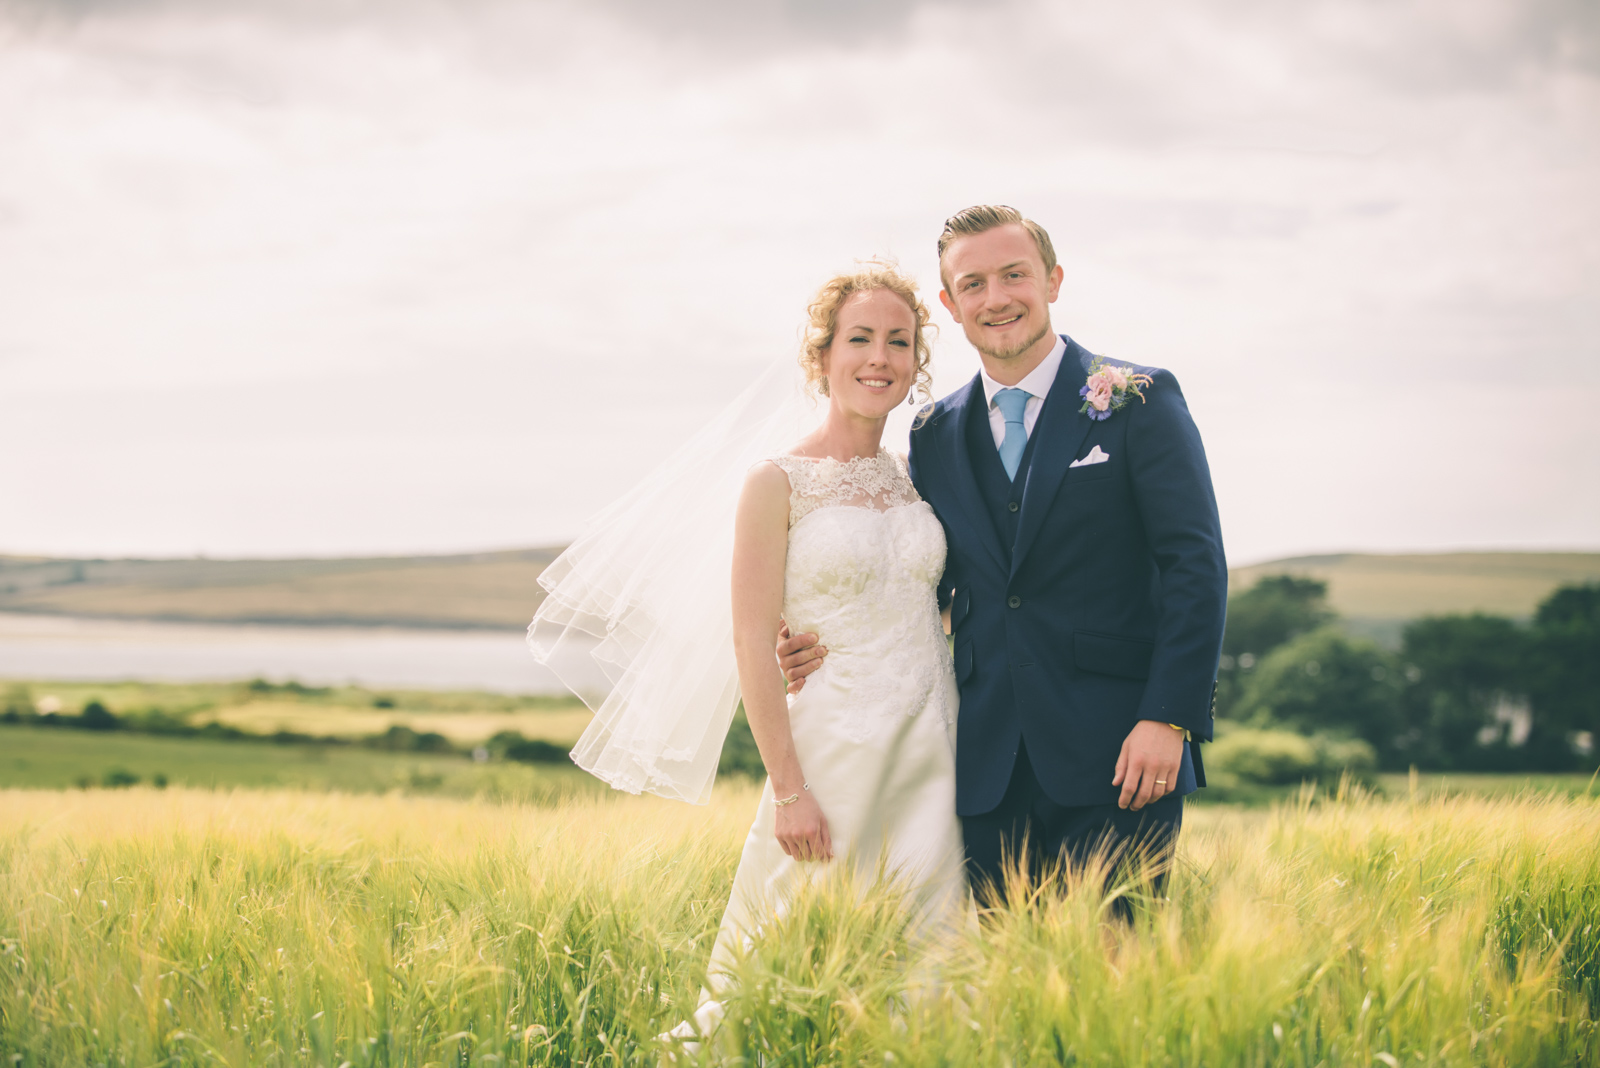 wedding-photography-rock-104.jpg